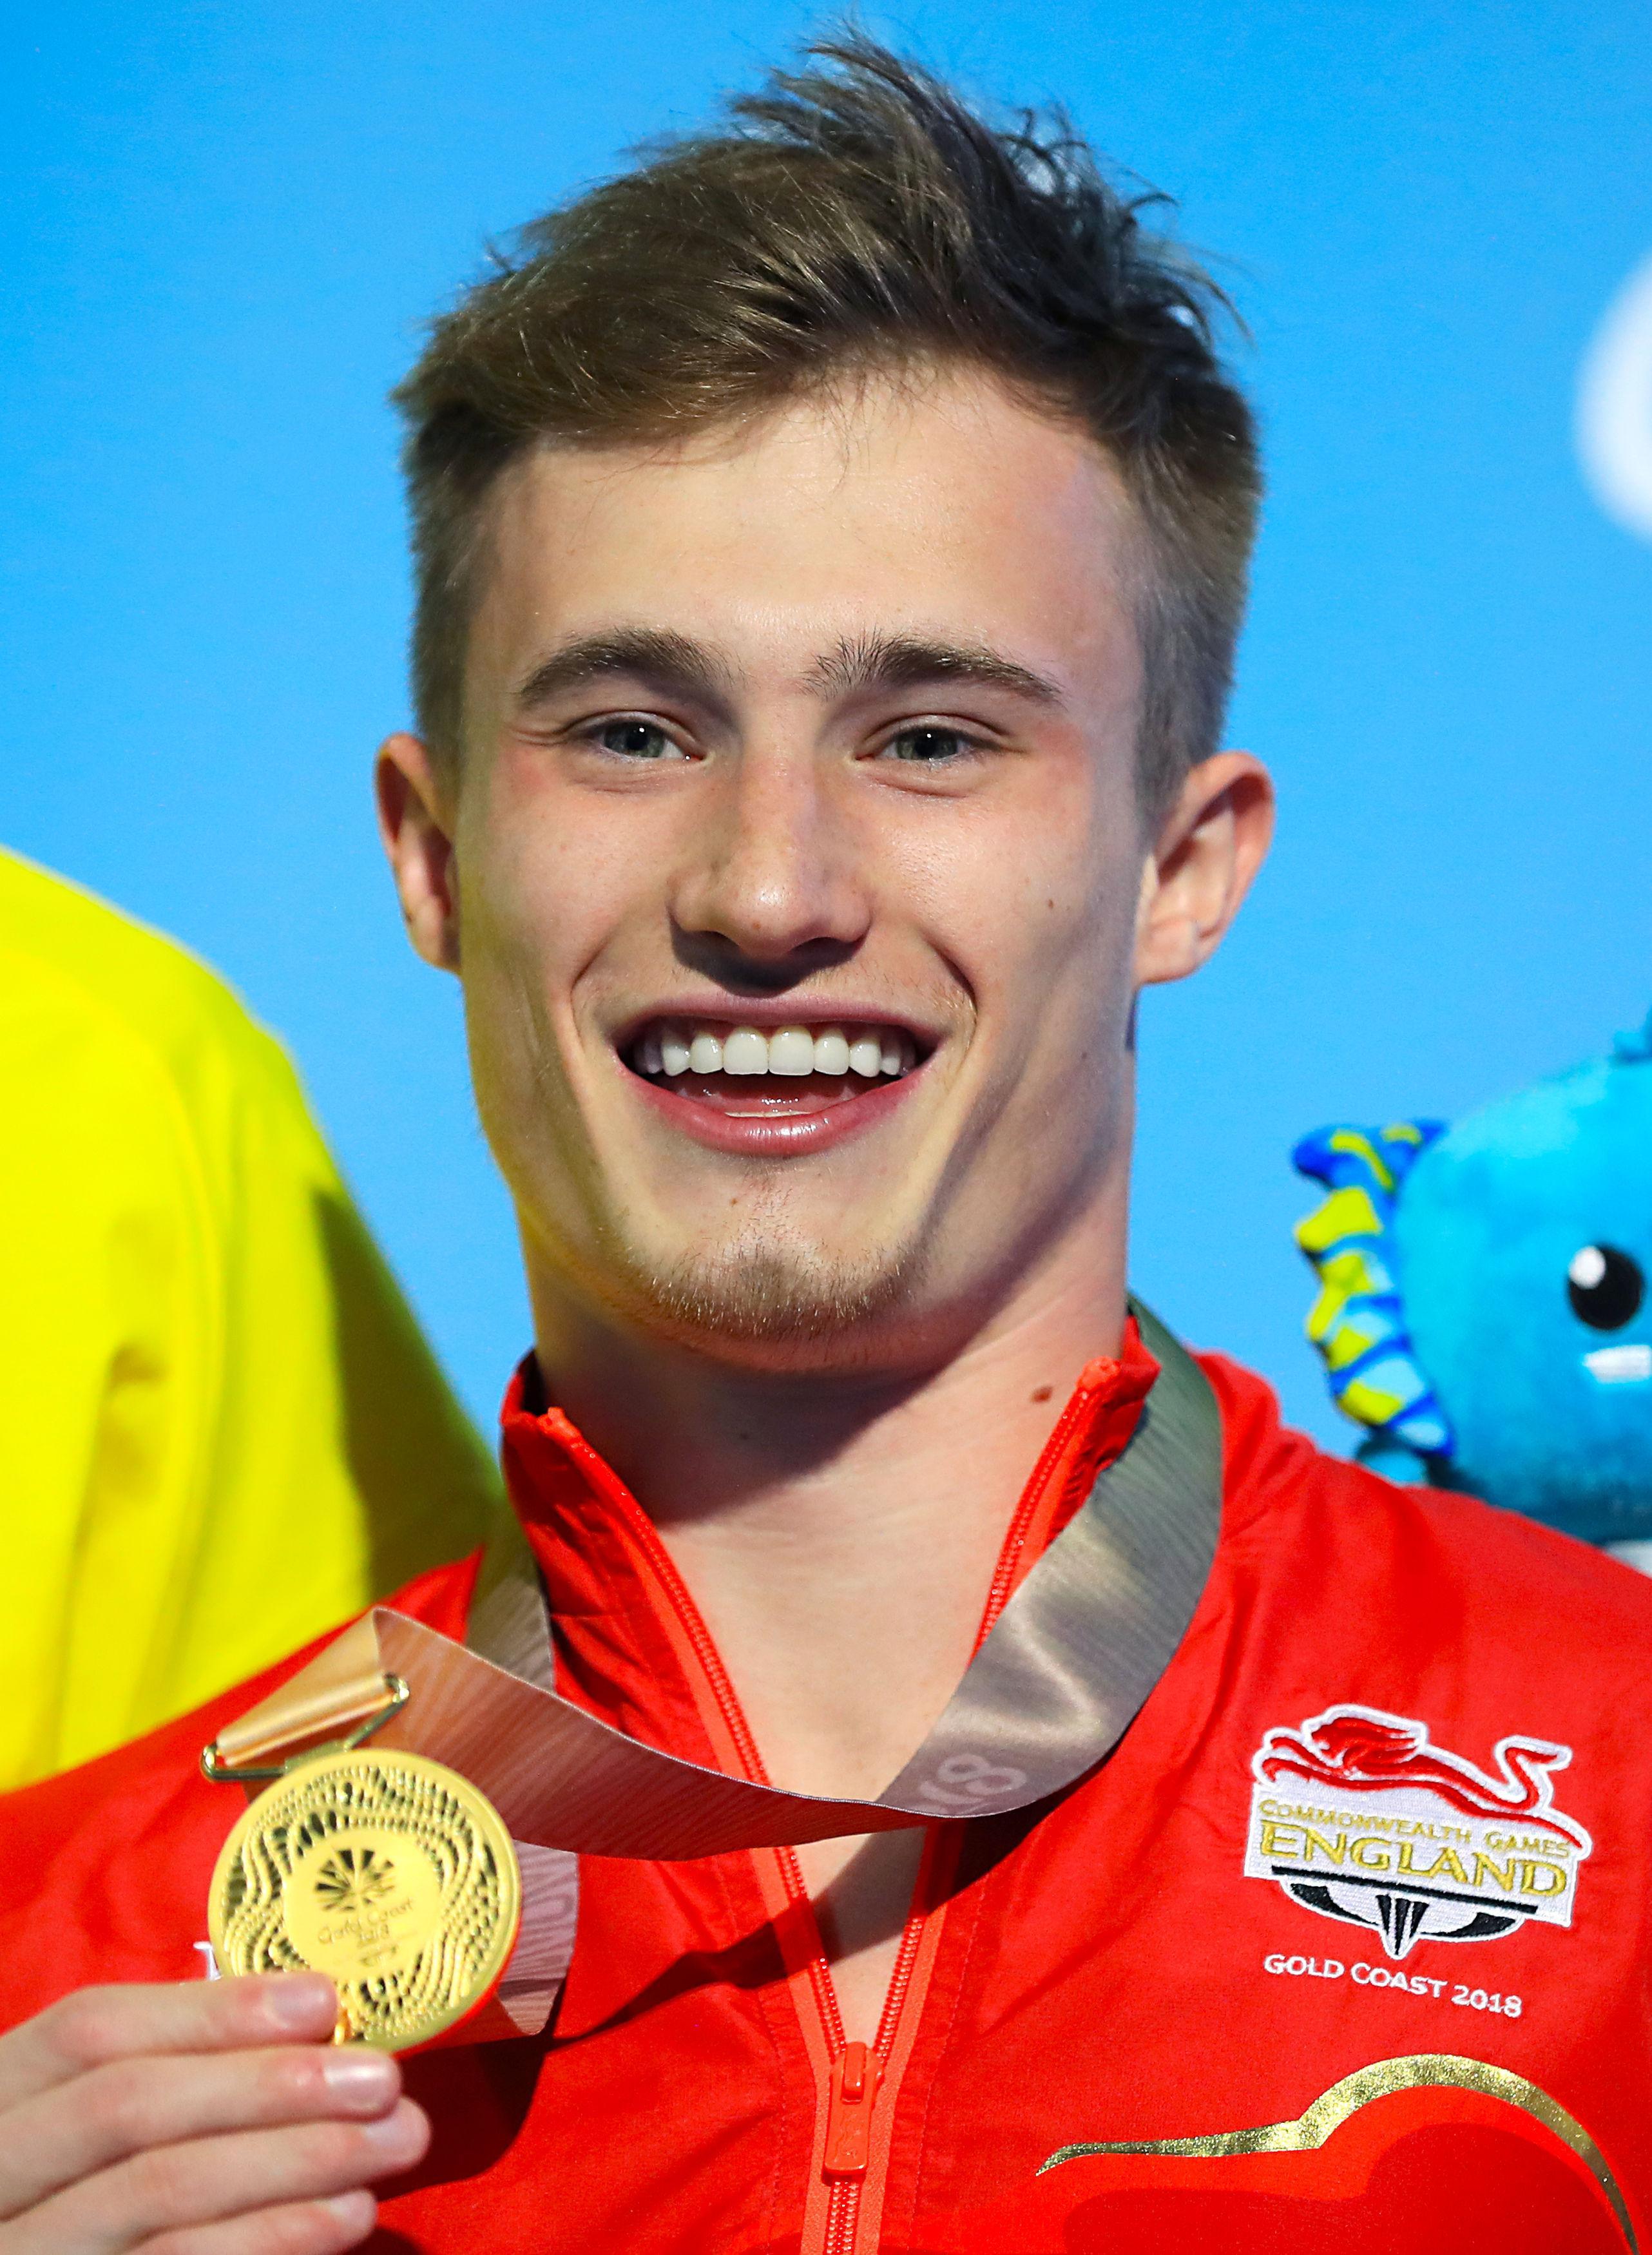 Laugher celebrates defending his Commonwealth title in Australia